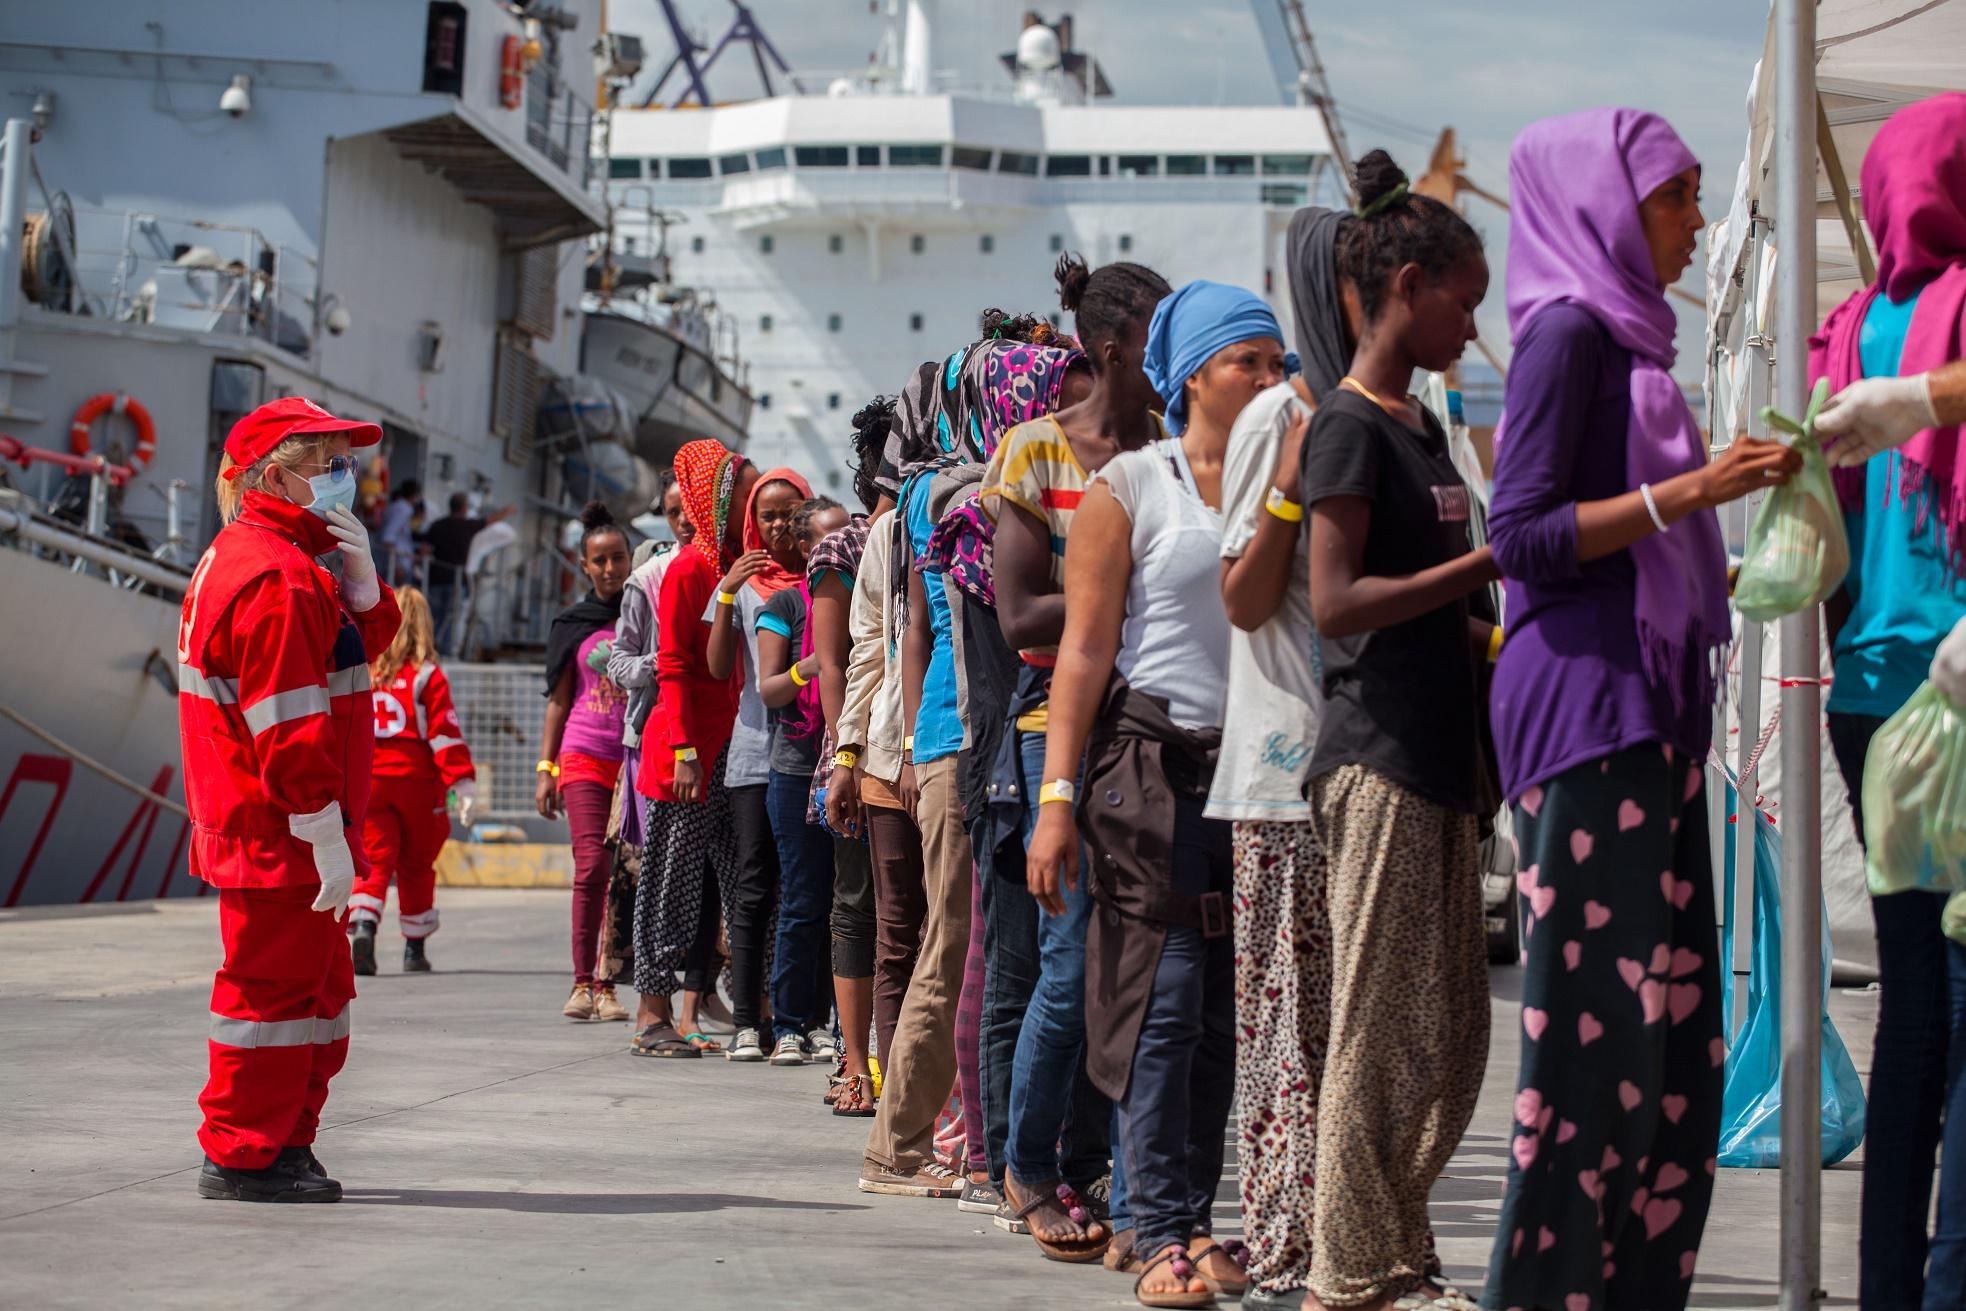 Grupo de imigrantes, oriundos da Líbia, desembarca no porto de Palermo, na Itália